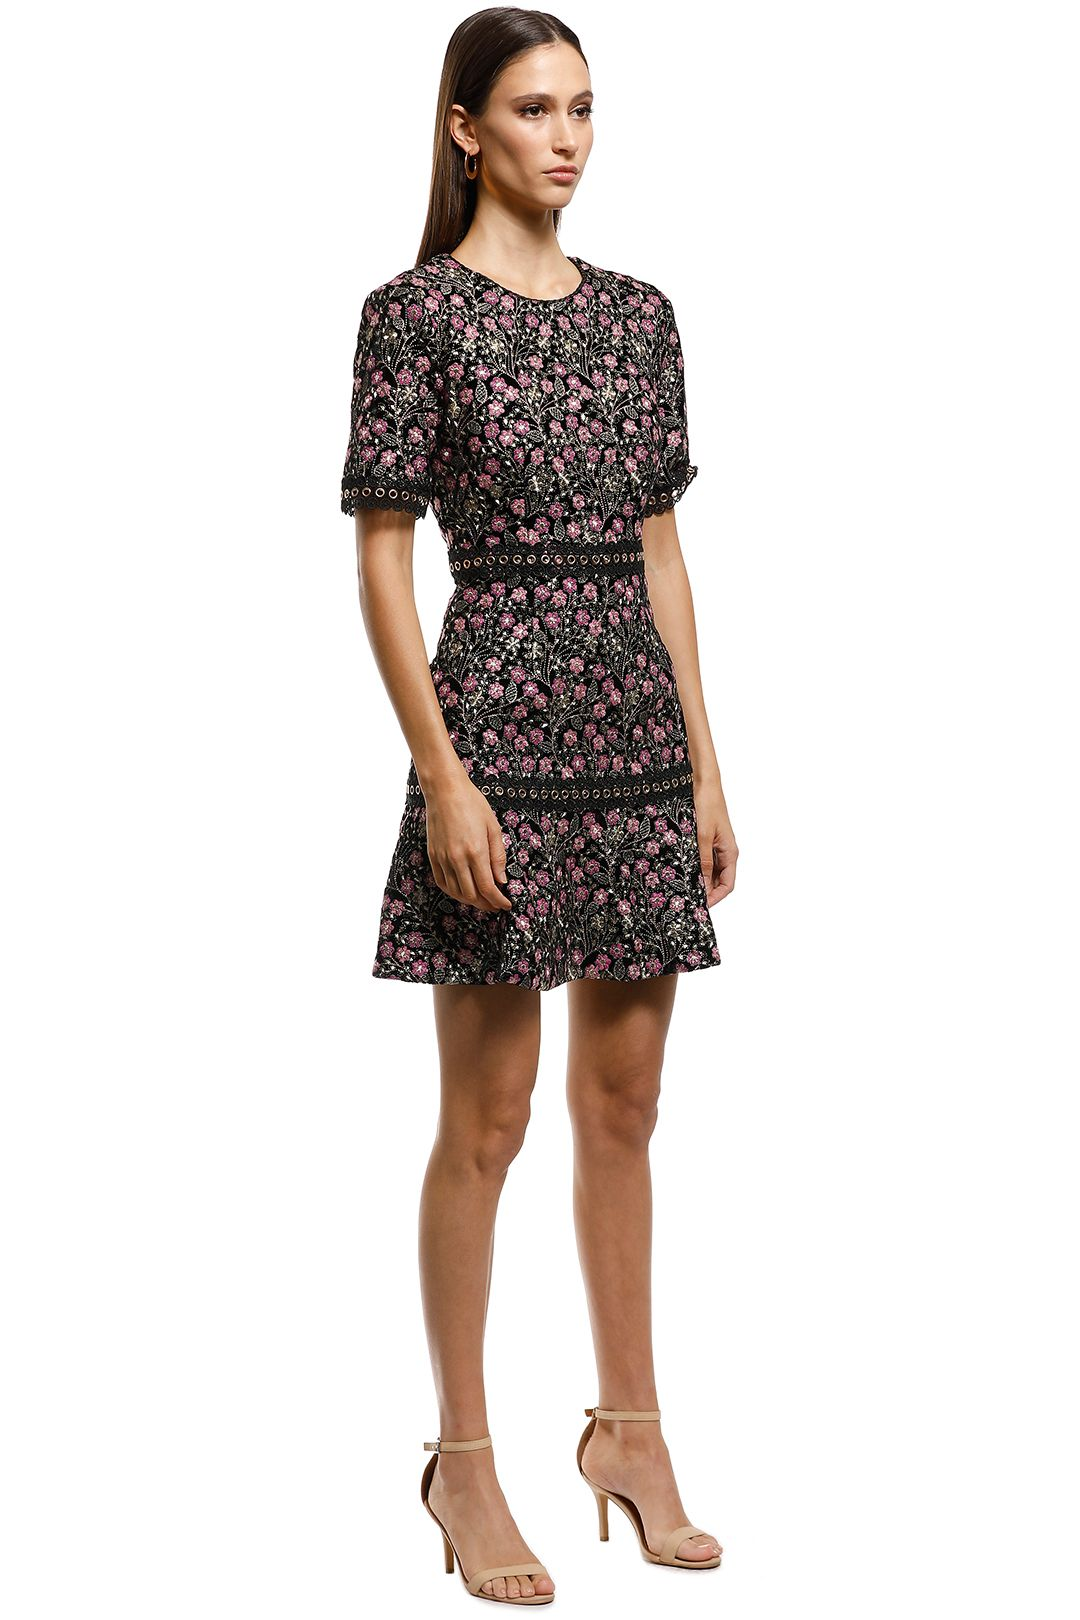 Elliatt - Icon Dress - Floral - Side